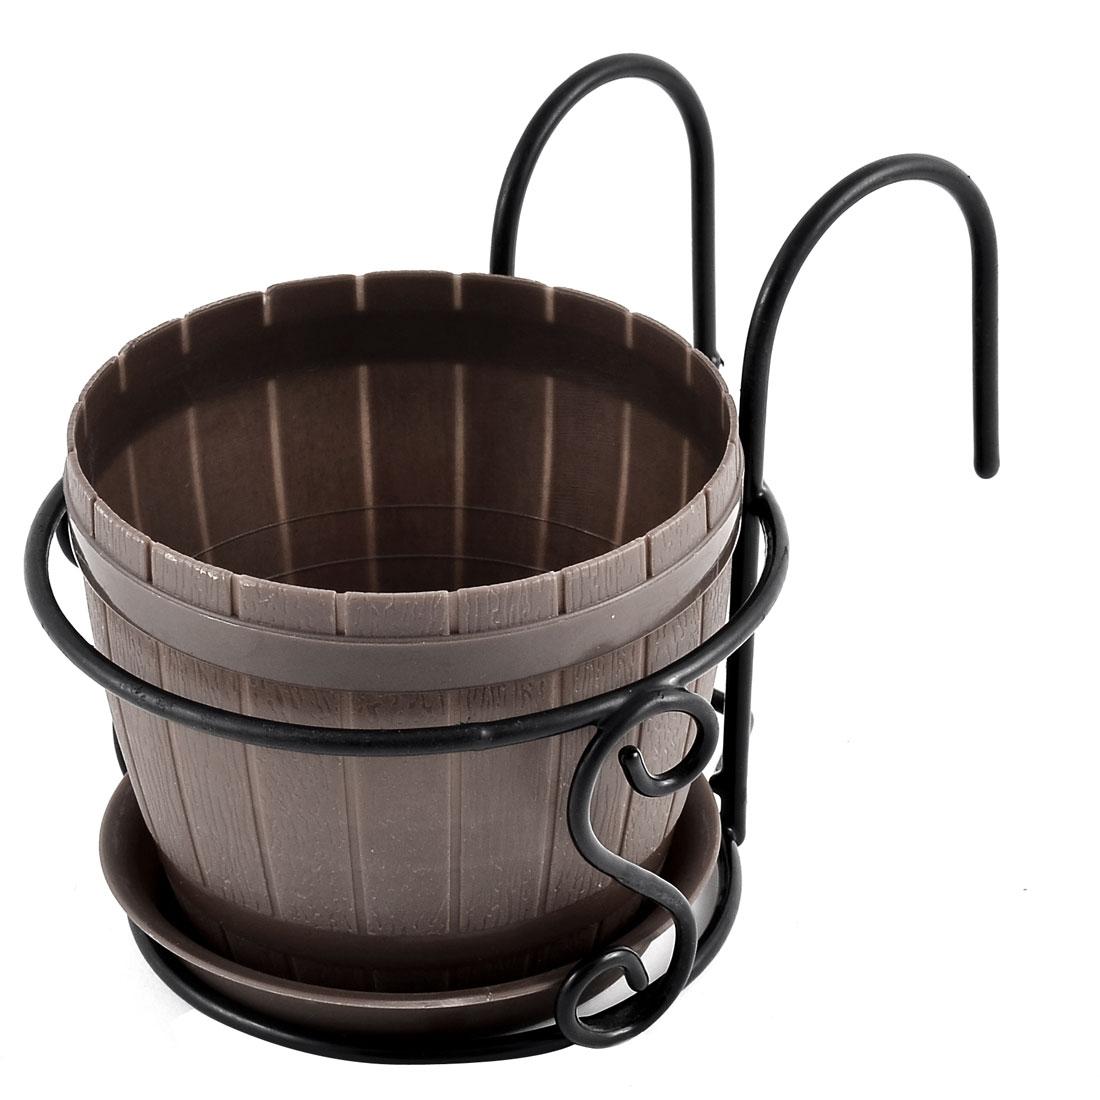 Home Patio Garden Plastic Bucket Shaped Cactus Aloe Plant Flower Pot Brown Black